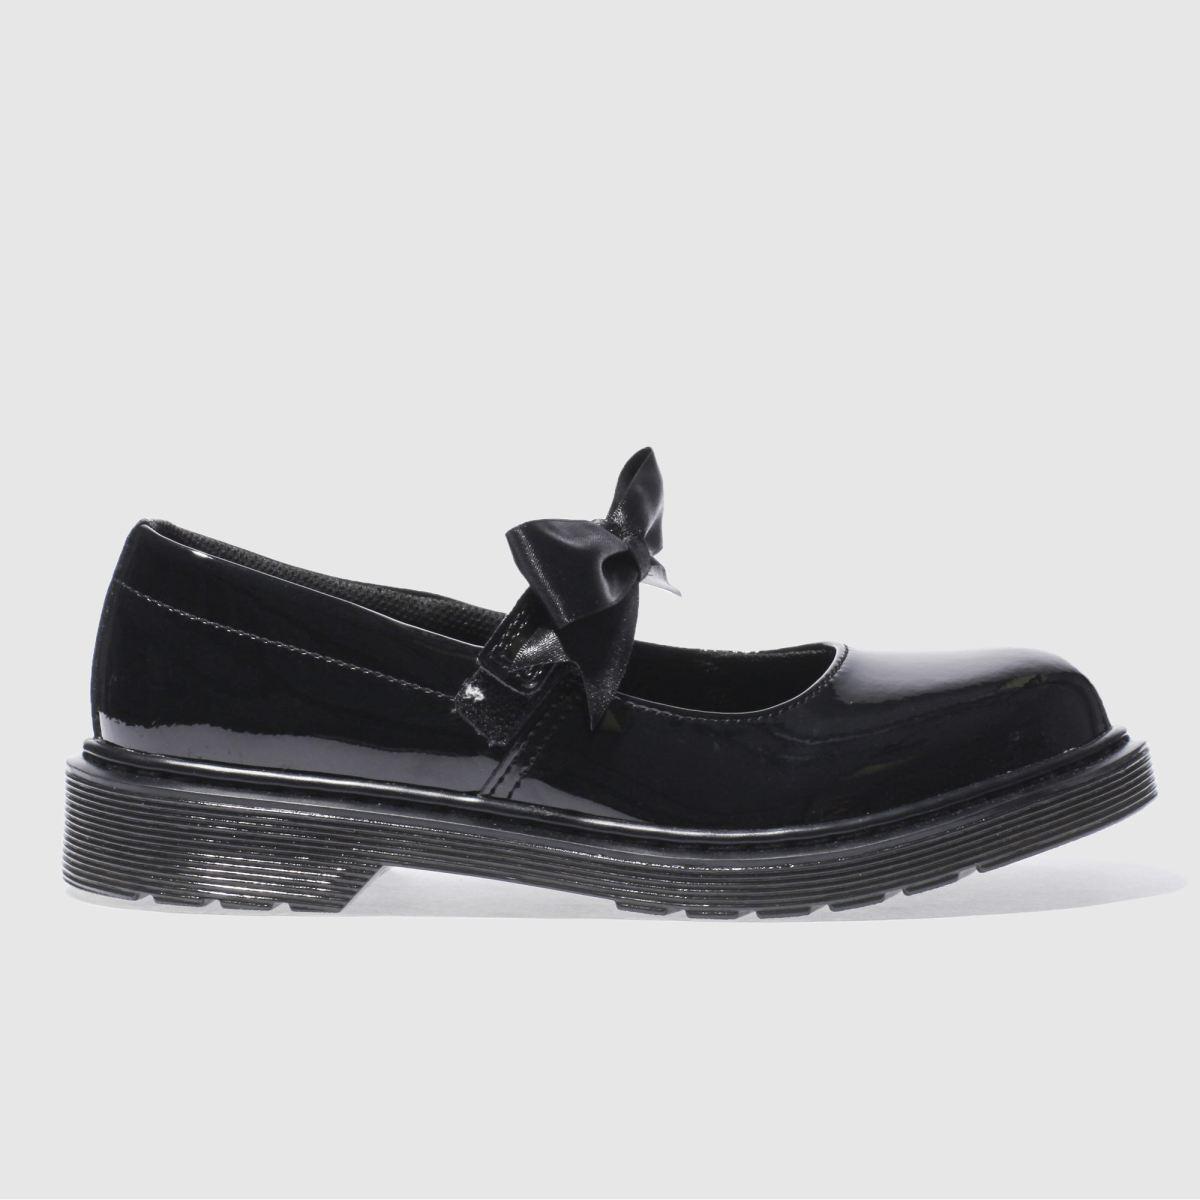 dr martens black dm maccy ii yth Girls Youth Shoes